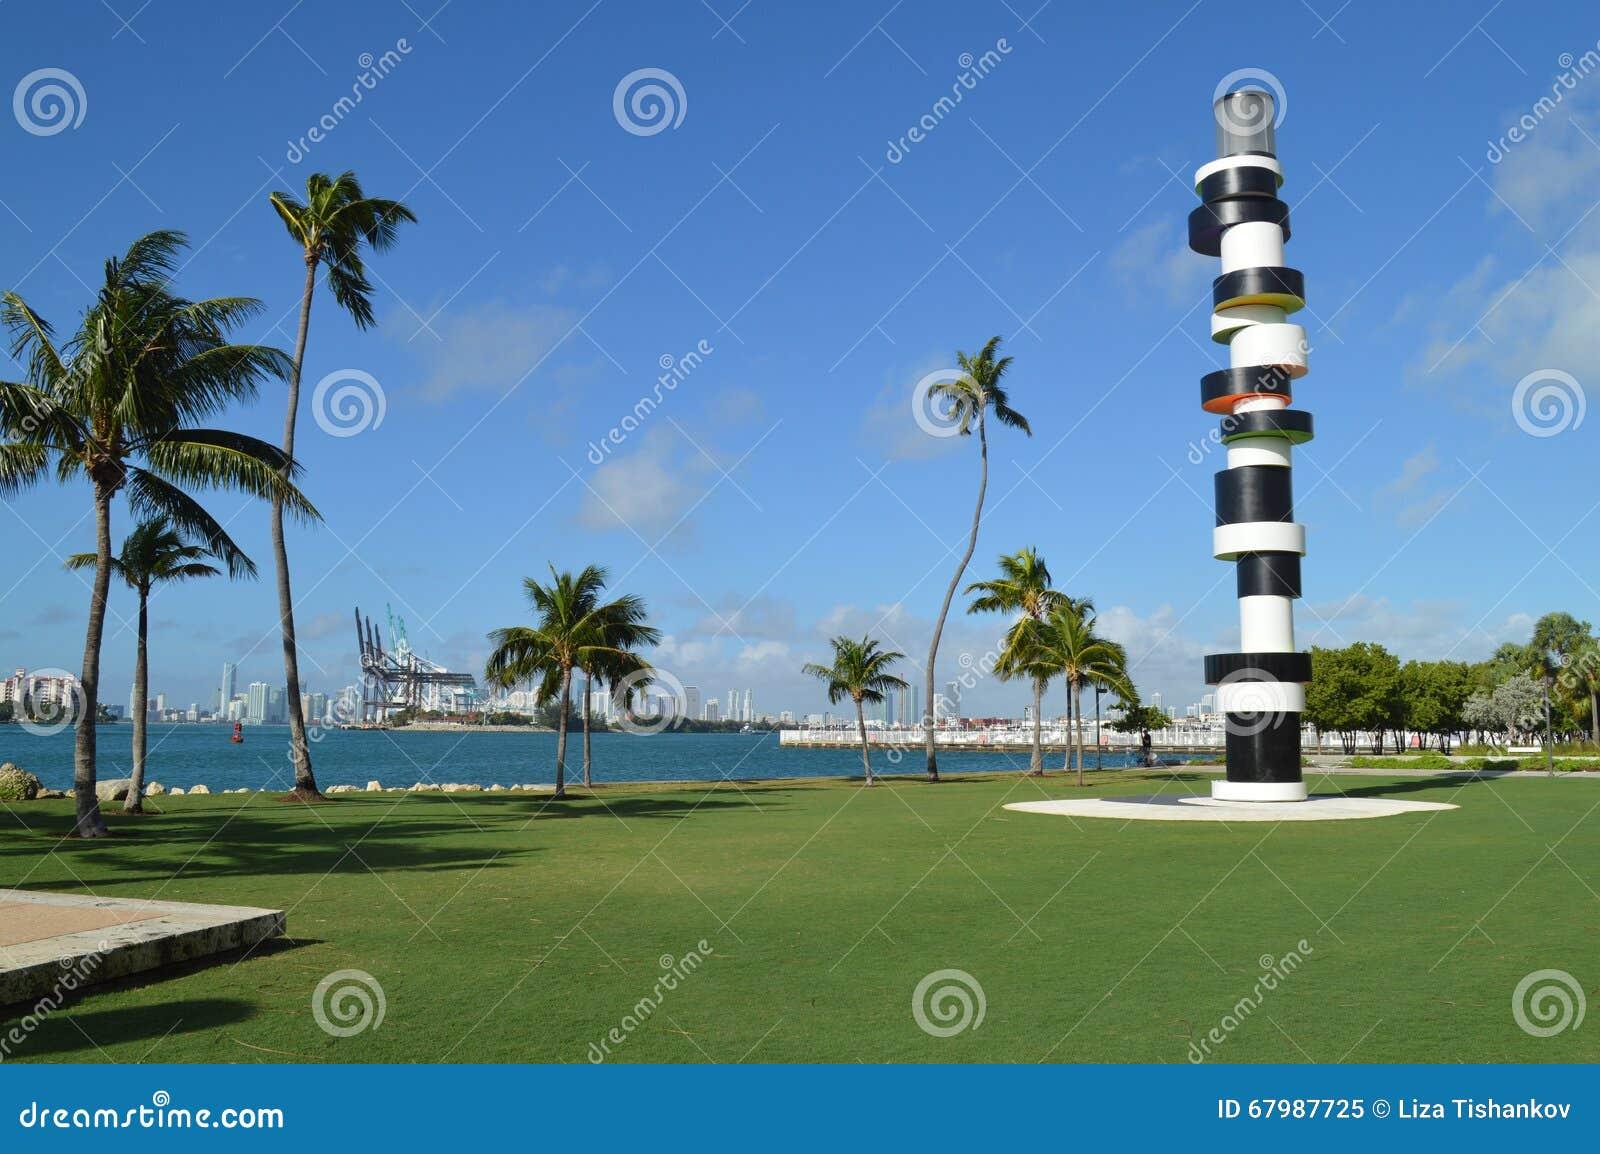 Tobias Rehberger Obstinate Lighthouse Sculpture, parque sul do ponto, Miami Beach